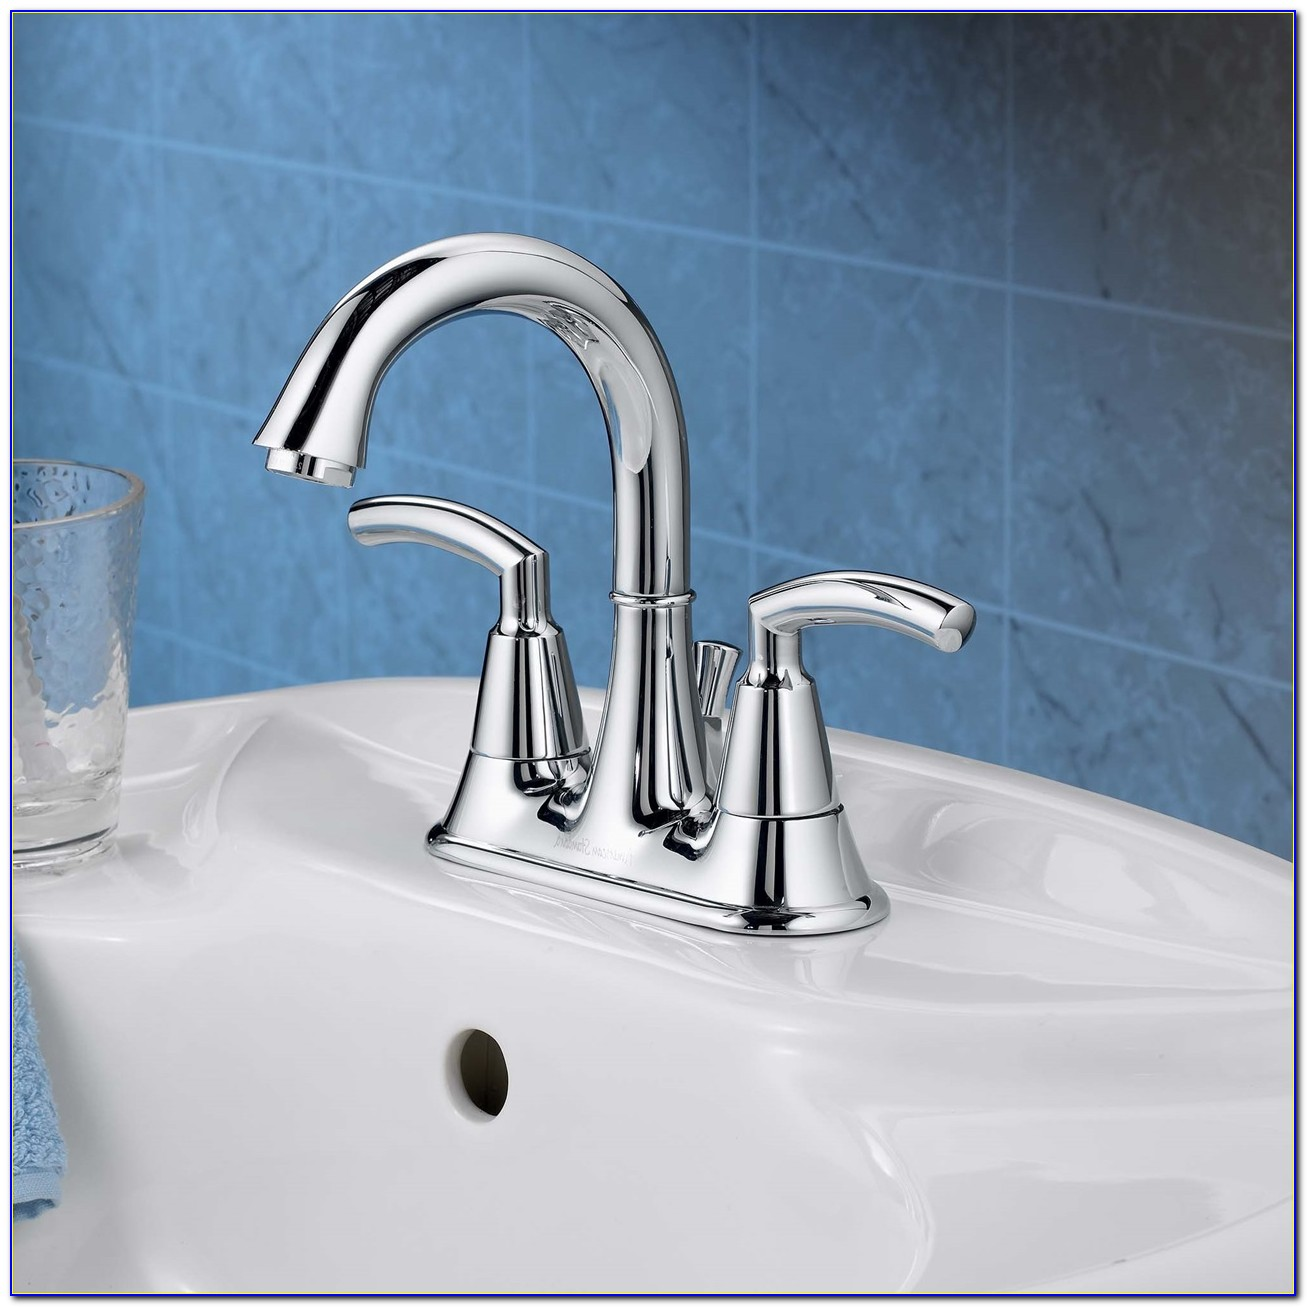 Courant 4 Inch Centerset Bathroom Faucet Polished Chrome & Porcelain Handles